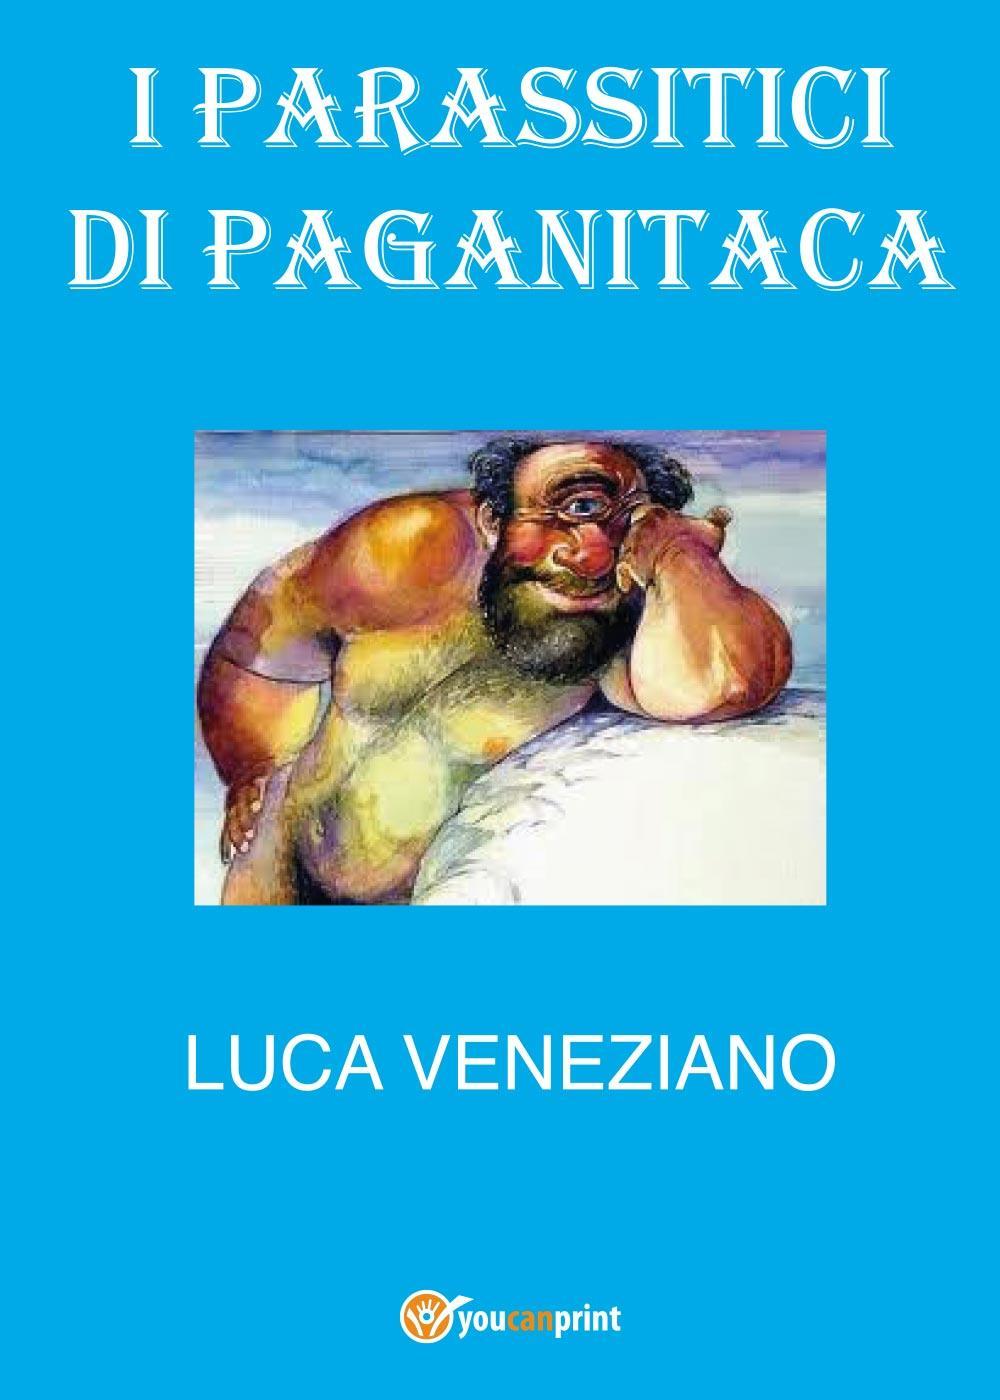 I parassitici di Paganitaca